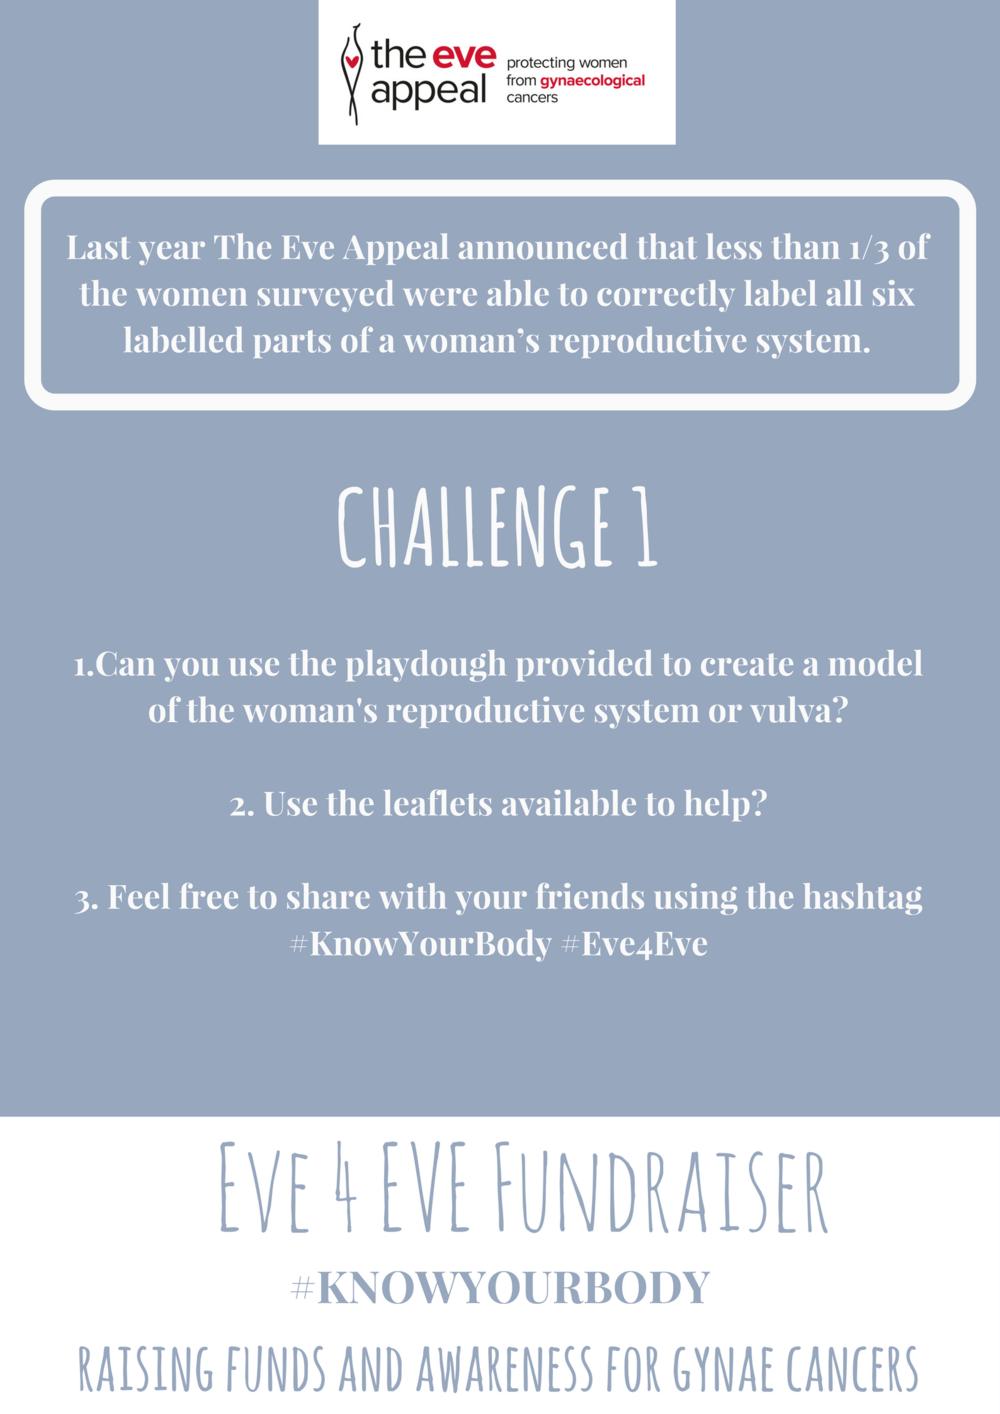 Challenge 1 challenge information sheet